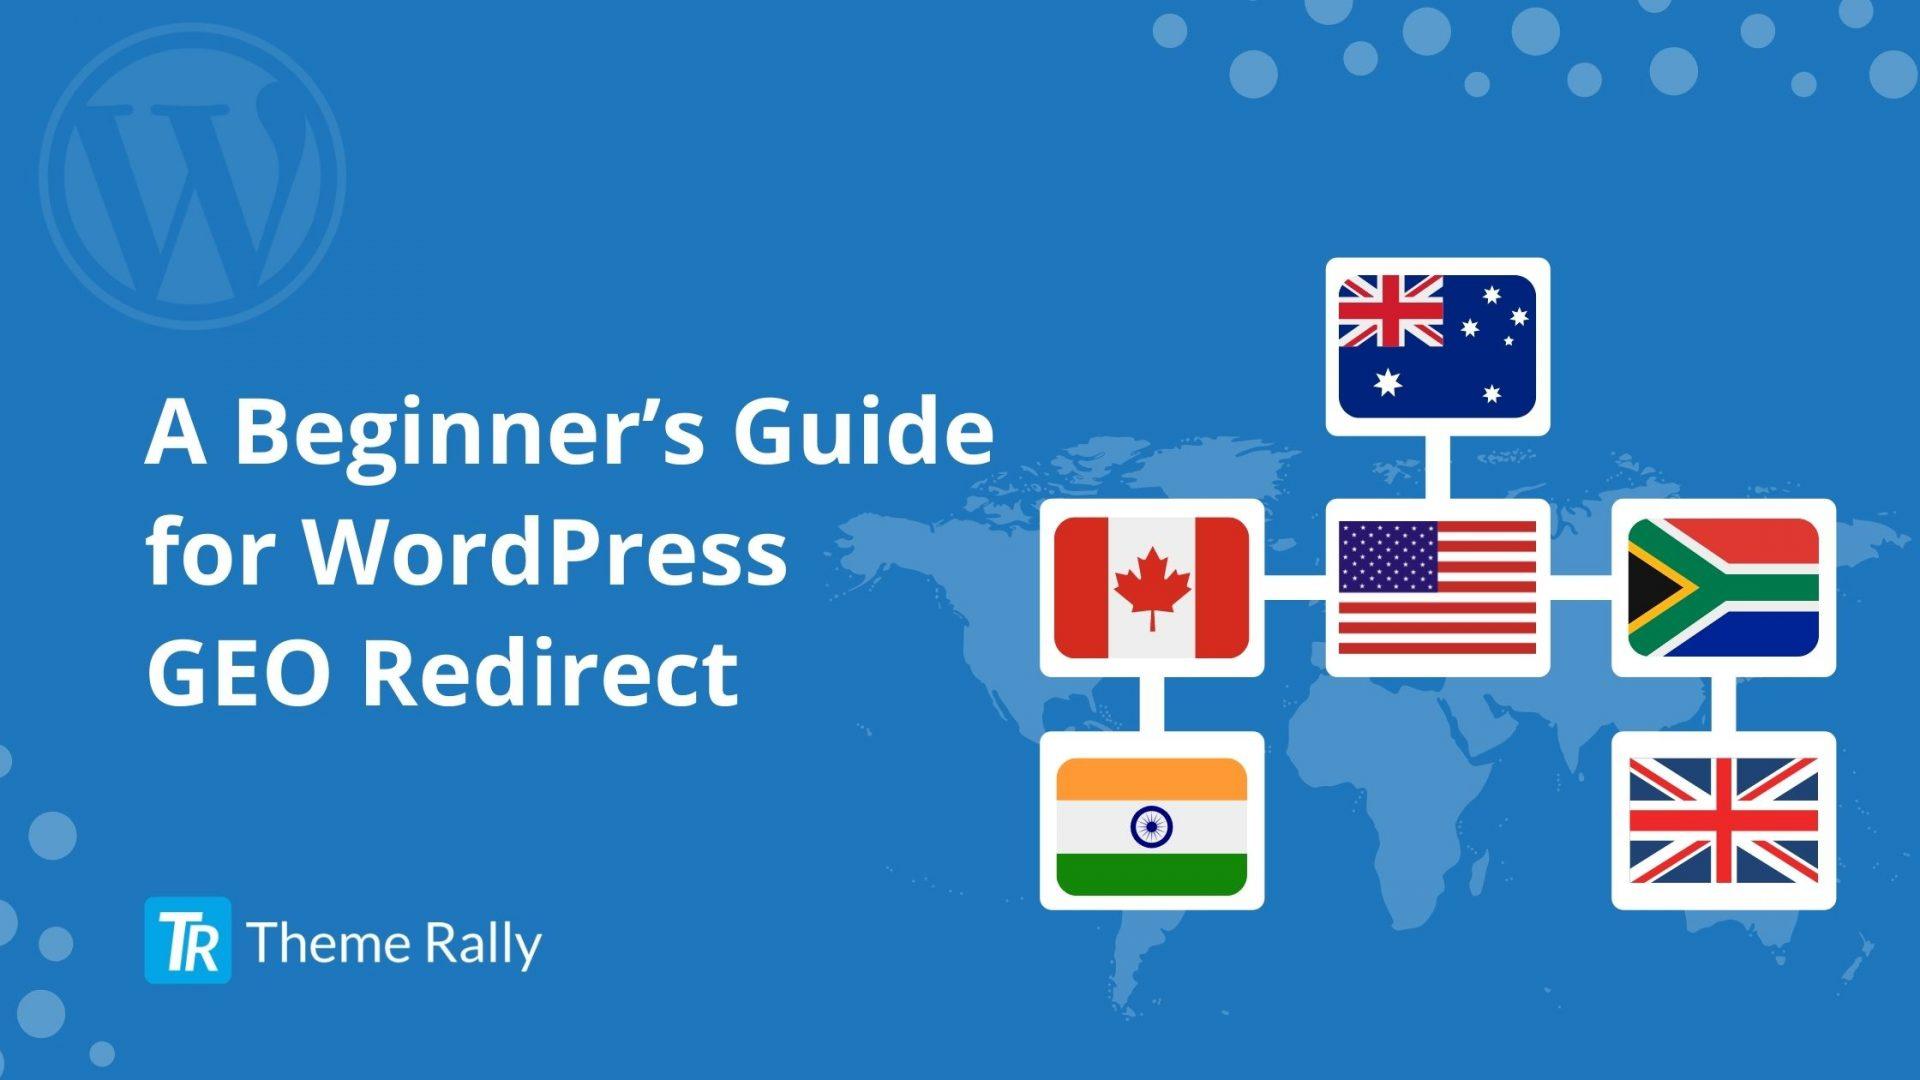 A Beginner's Guide for WordPress GEO Redirect